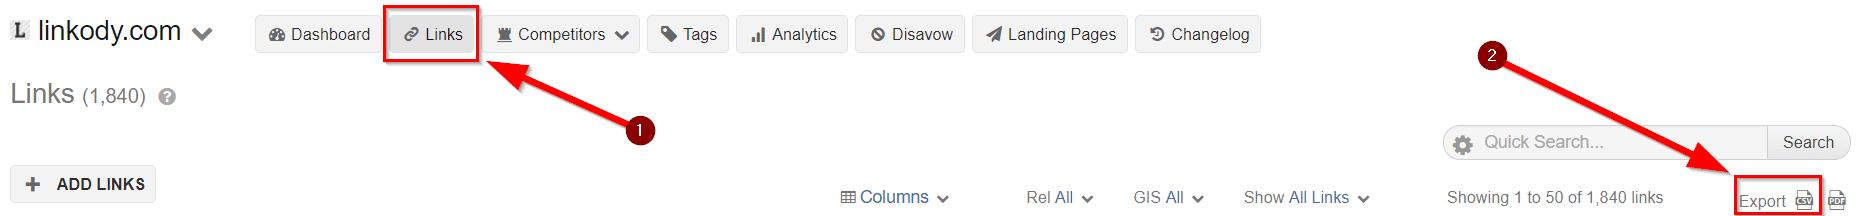 Linkody data reports